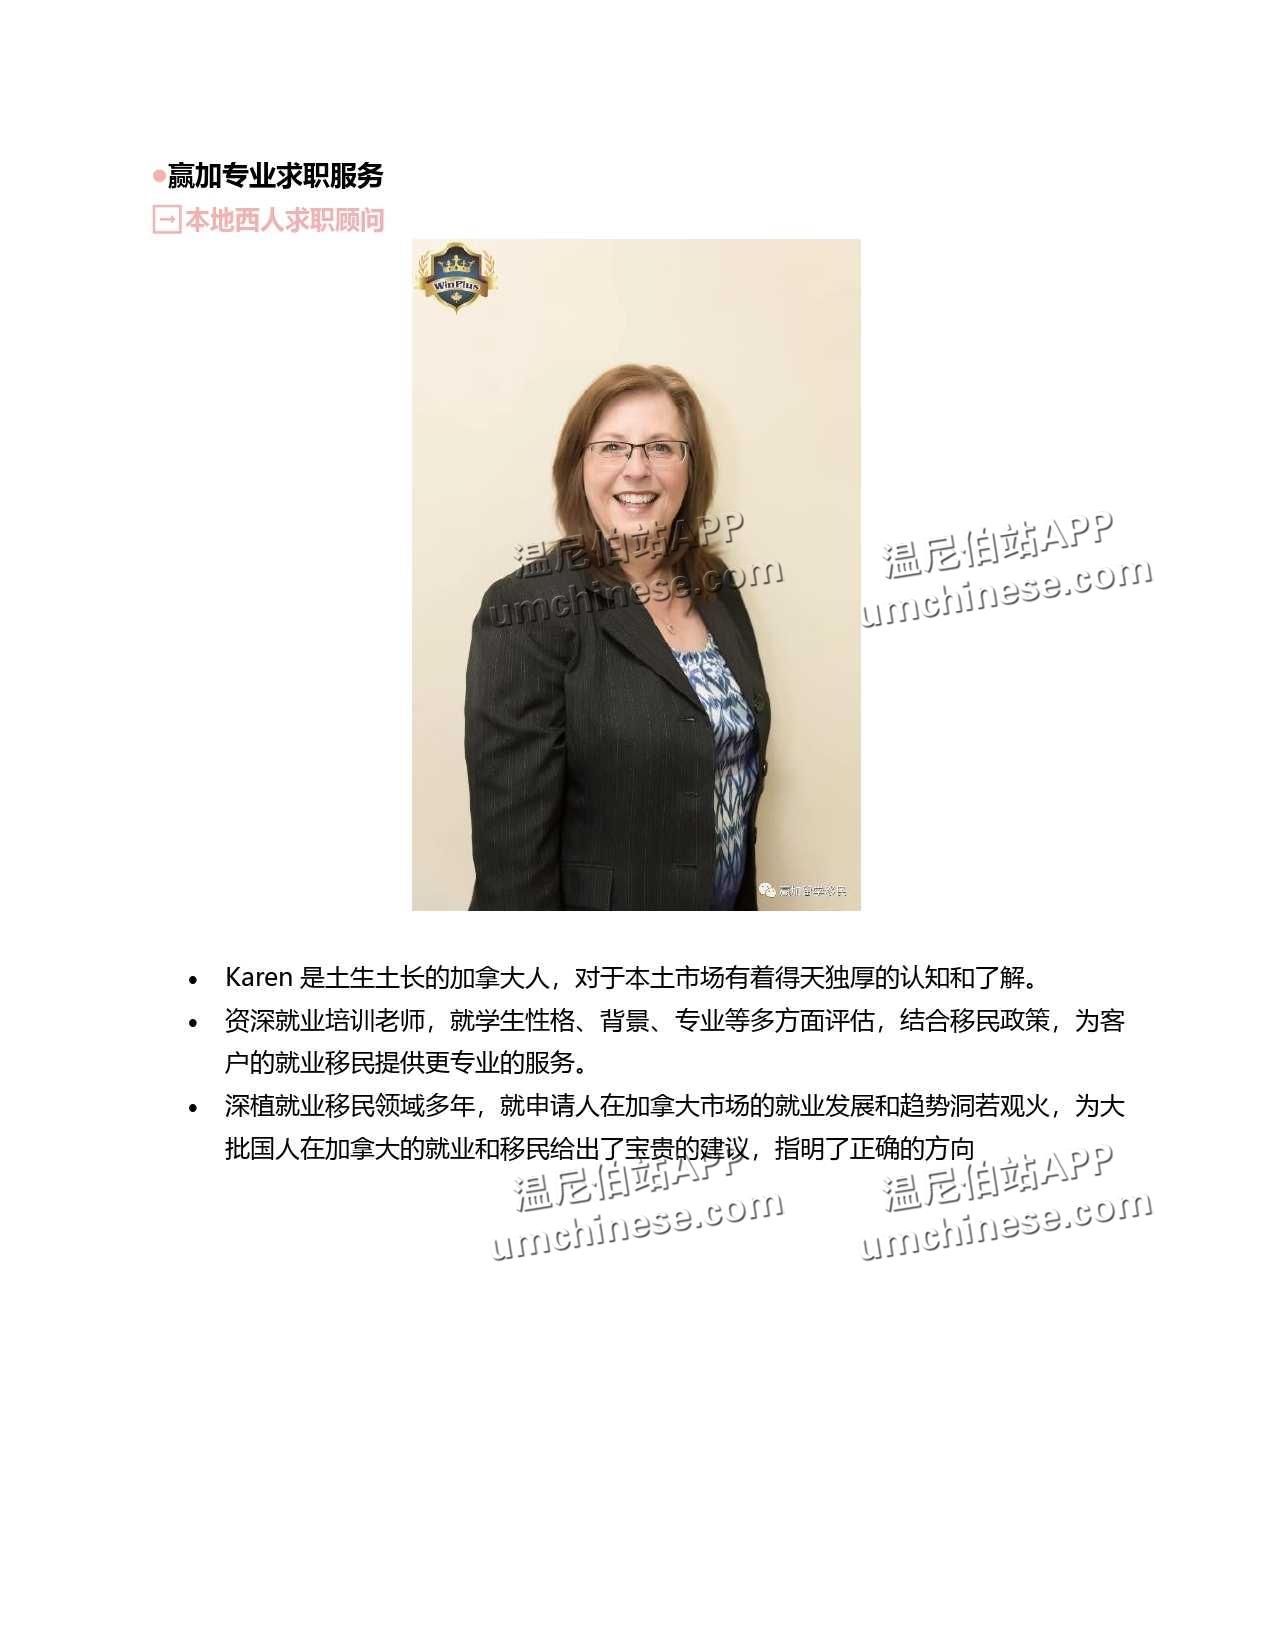 香港政策_page-0004.jpg